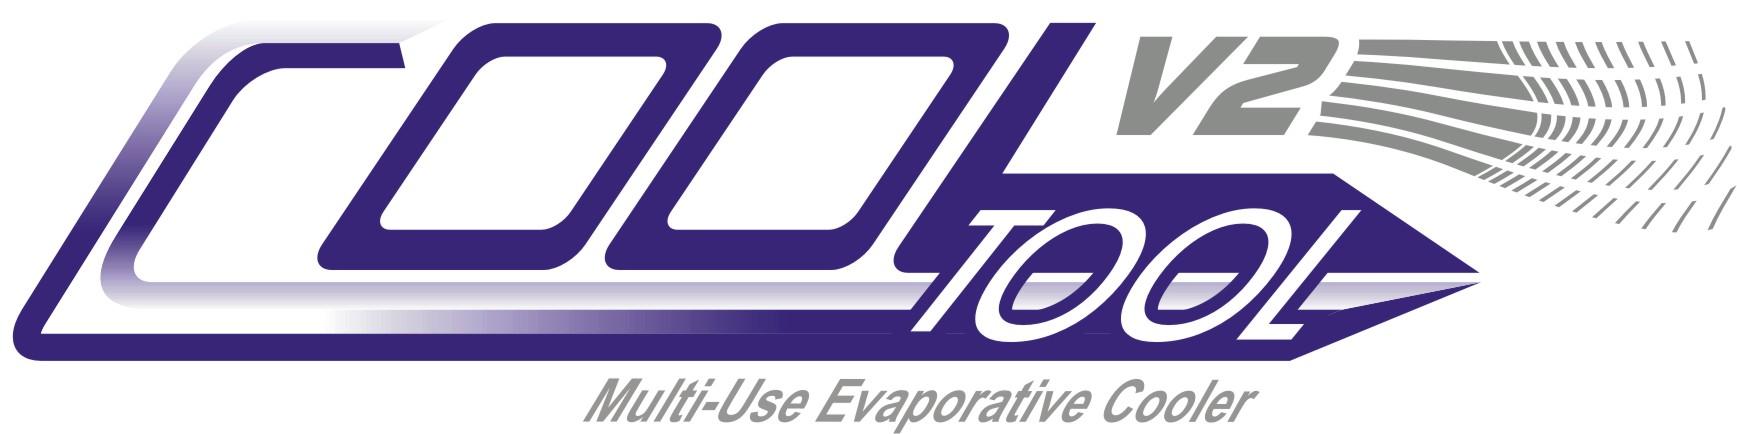 cooltoolv2-logo.jpg